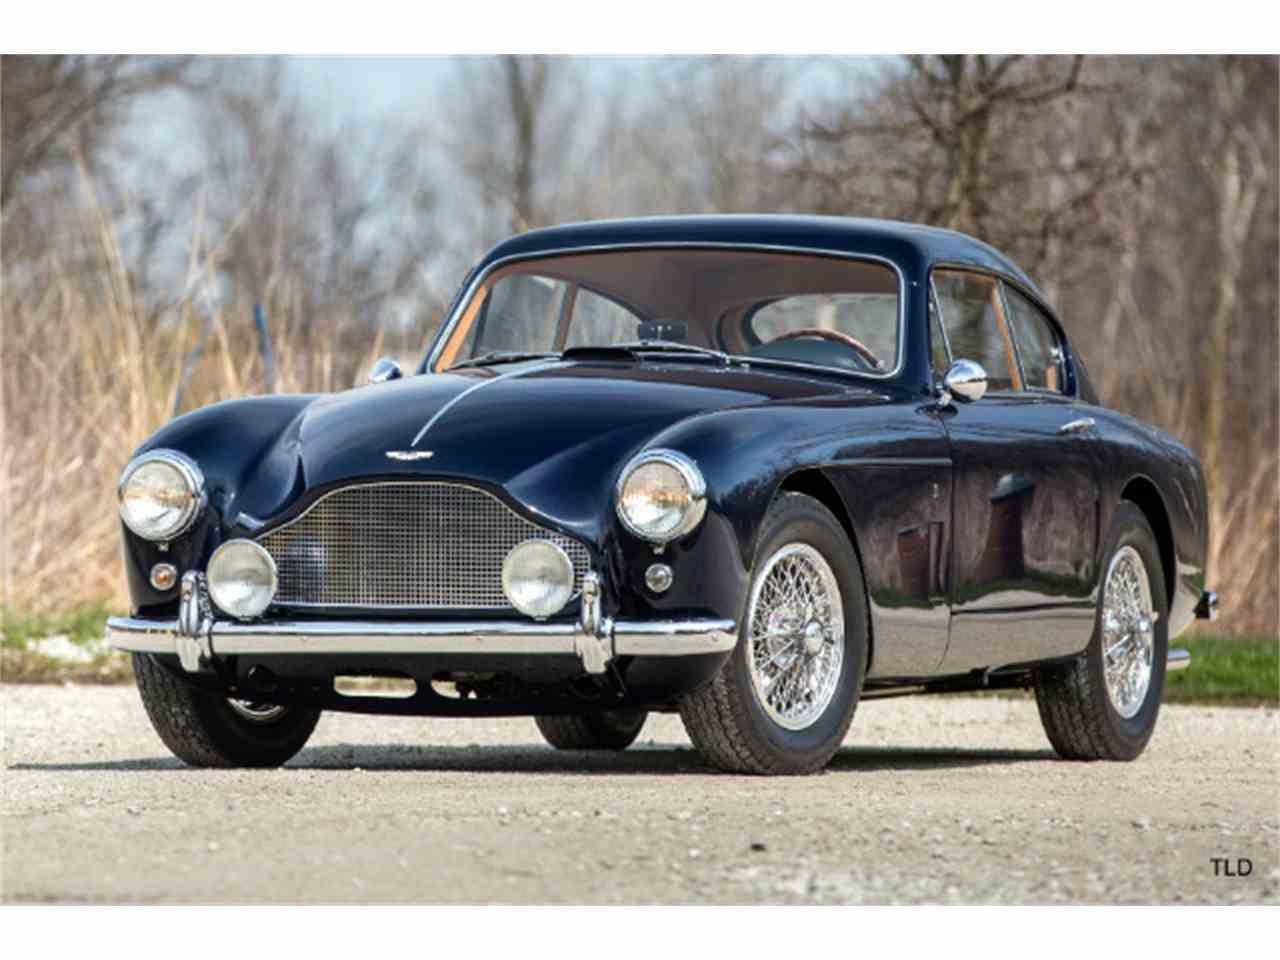 1958 Aston Martin Db4 For Sale Listing Id Cc 1049243 Classiccars Com Driveyourdream Astonmartin Aston Martin Aston Martin Db2 Aston Martin Db4